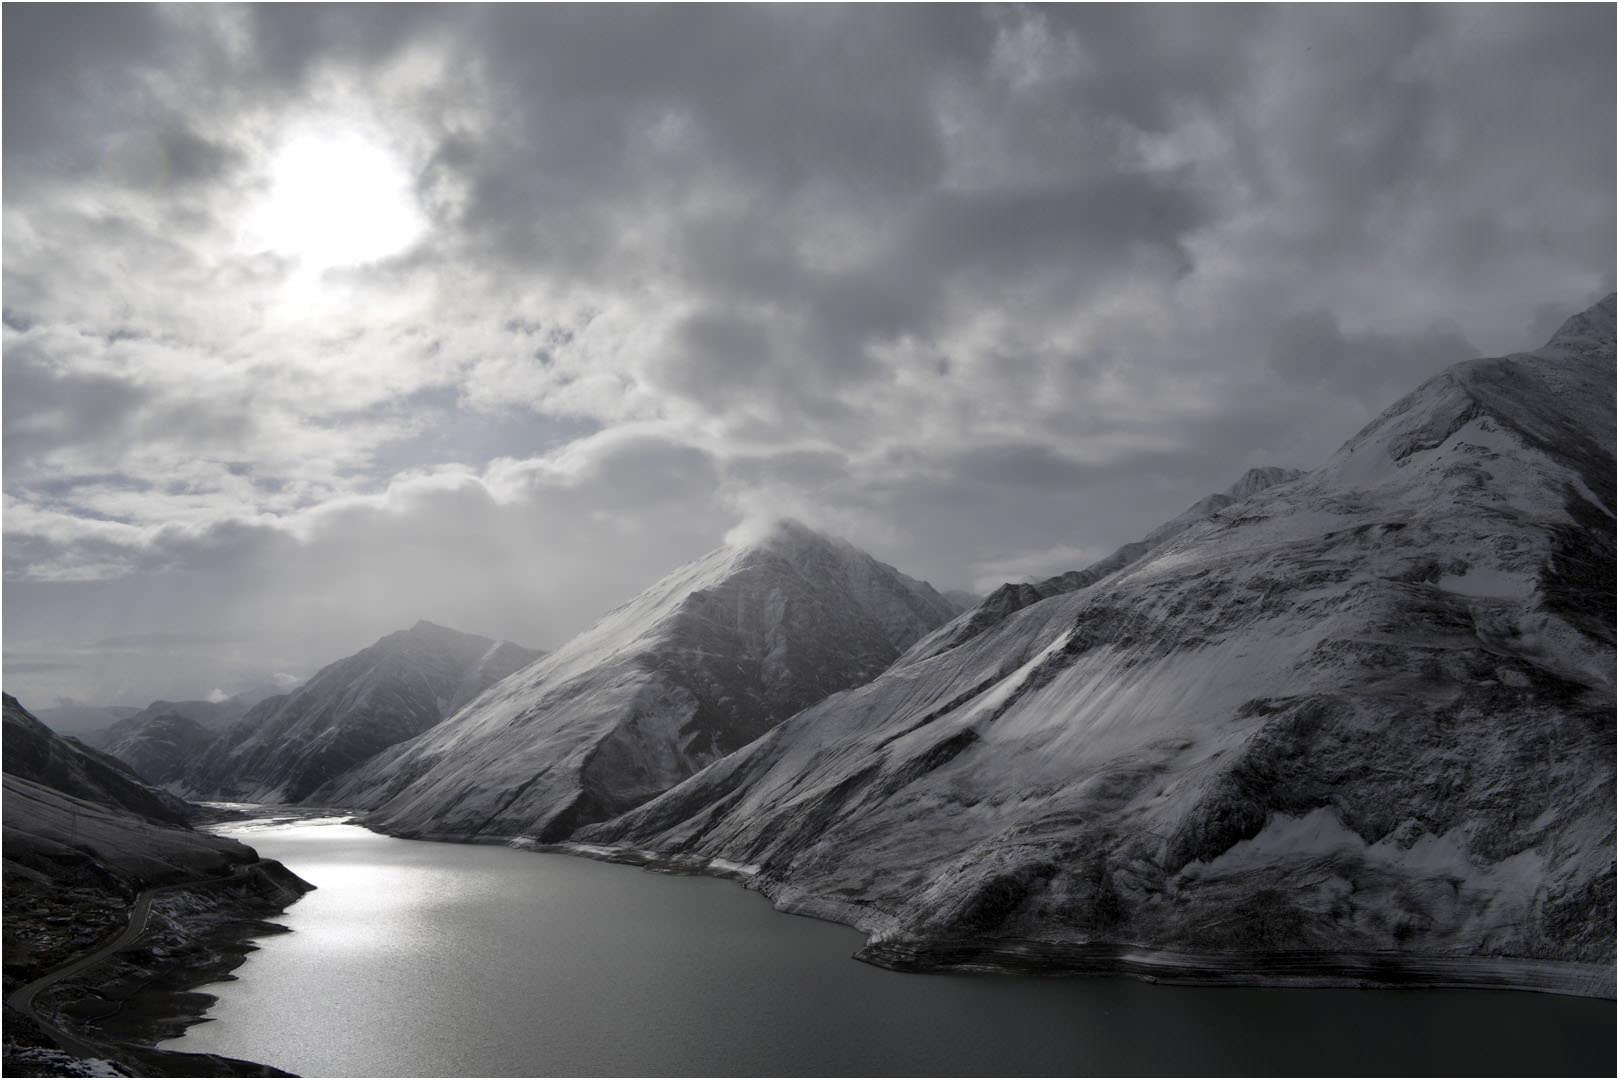 Tibet 5000 metres